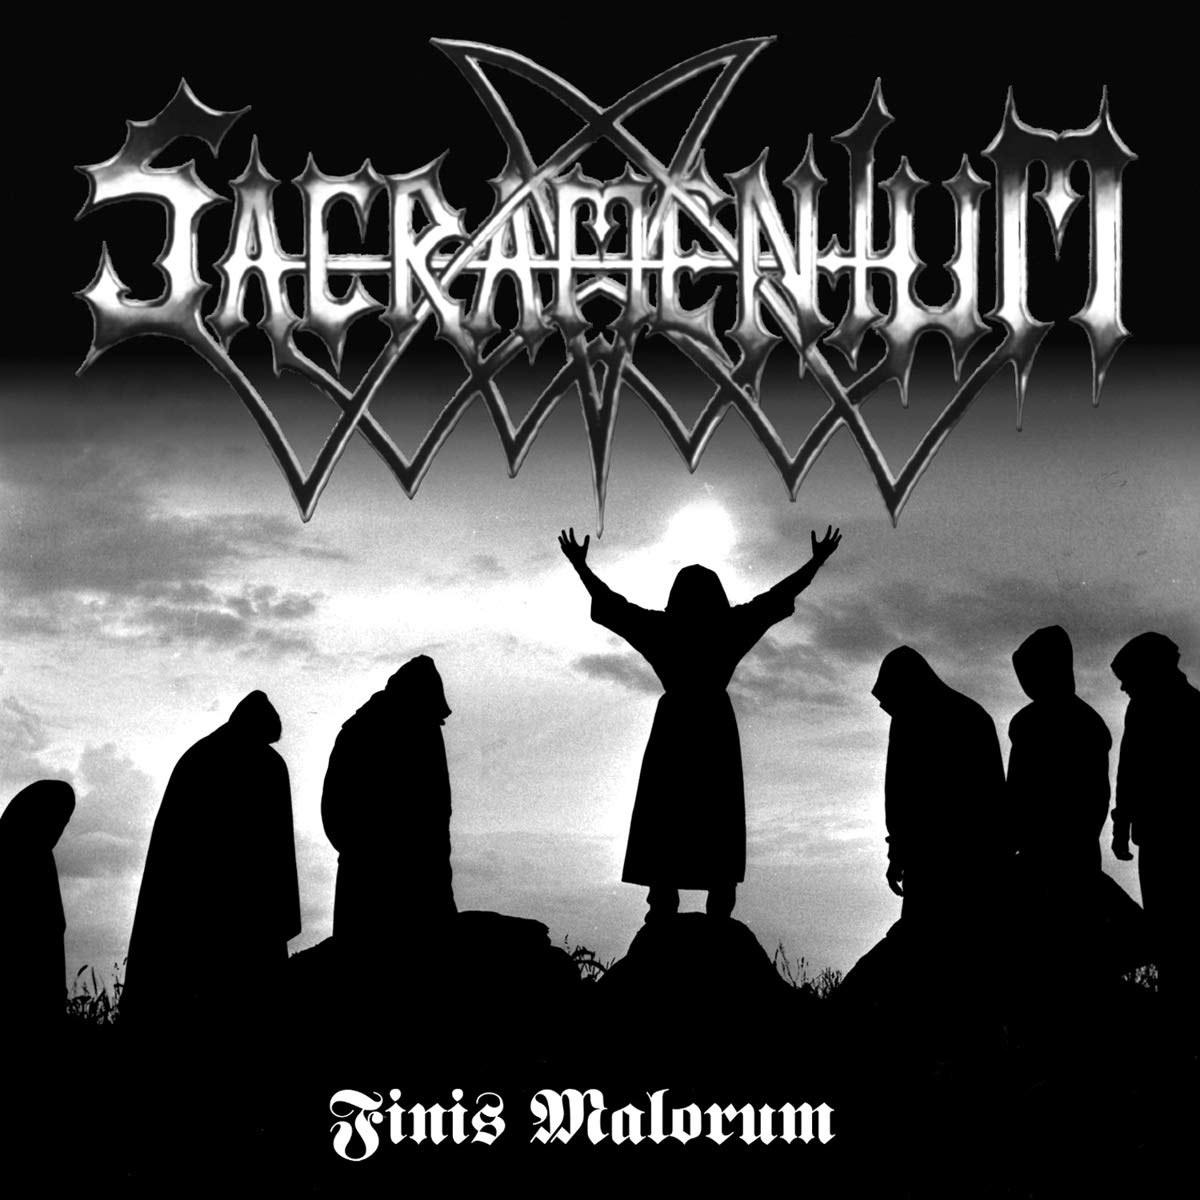 Review for Sacramentum - Finis Malorum